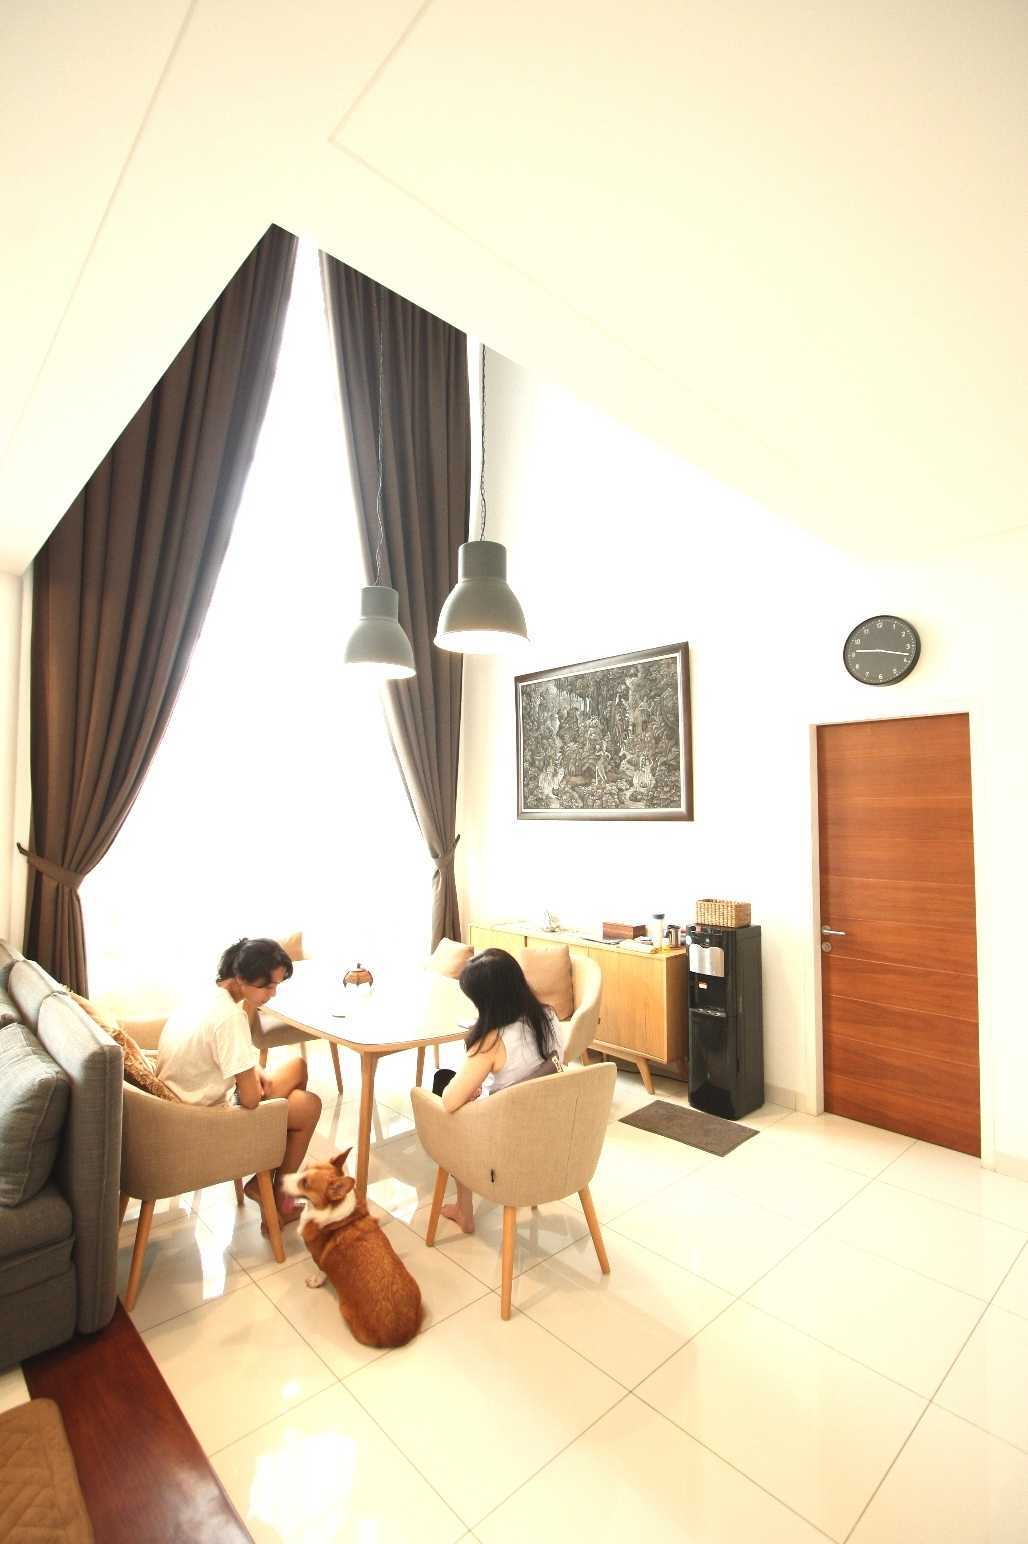 Ddap Architect Foresta Fiore House Bsd Tangerang Bsd Tangerang Img0971 Skandinavia  29575